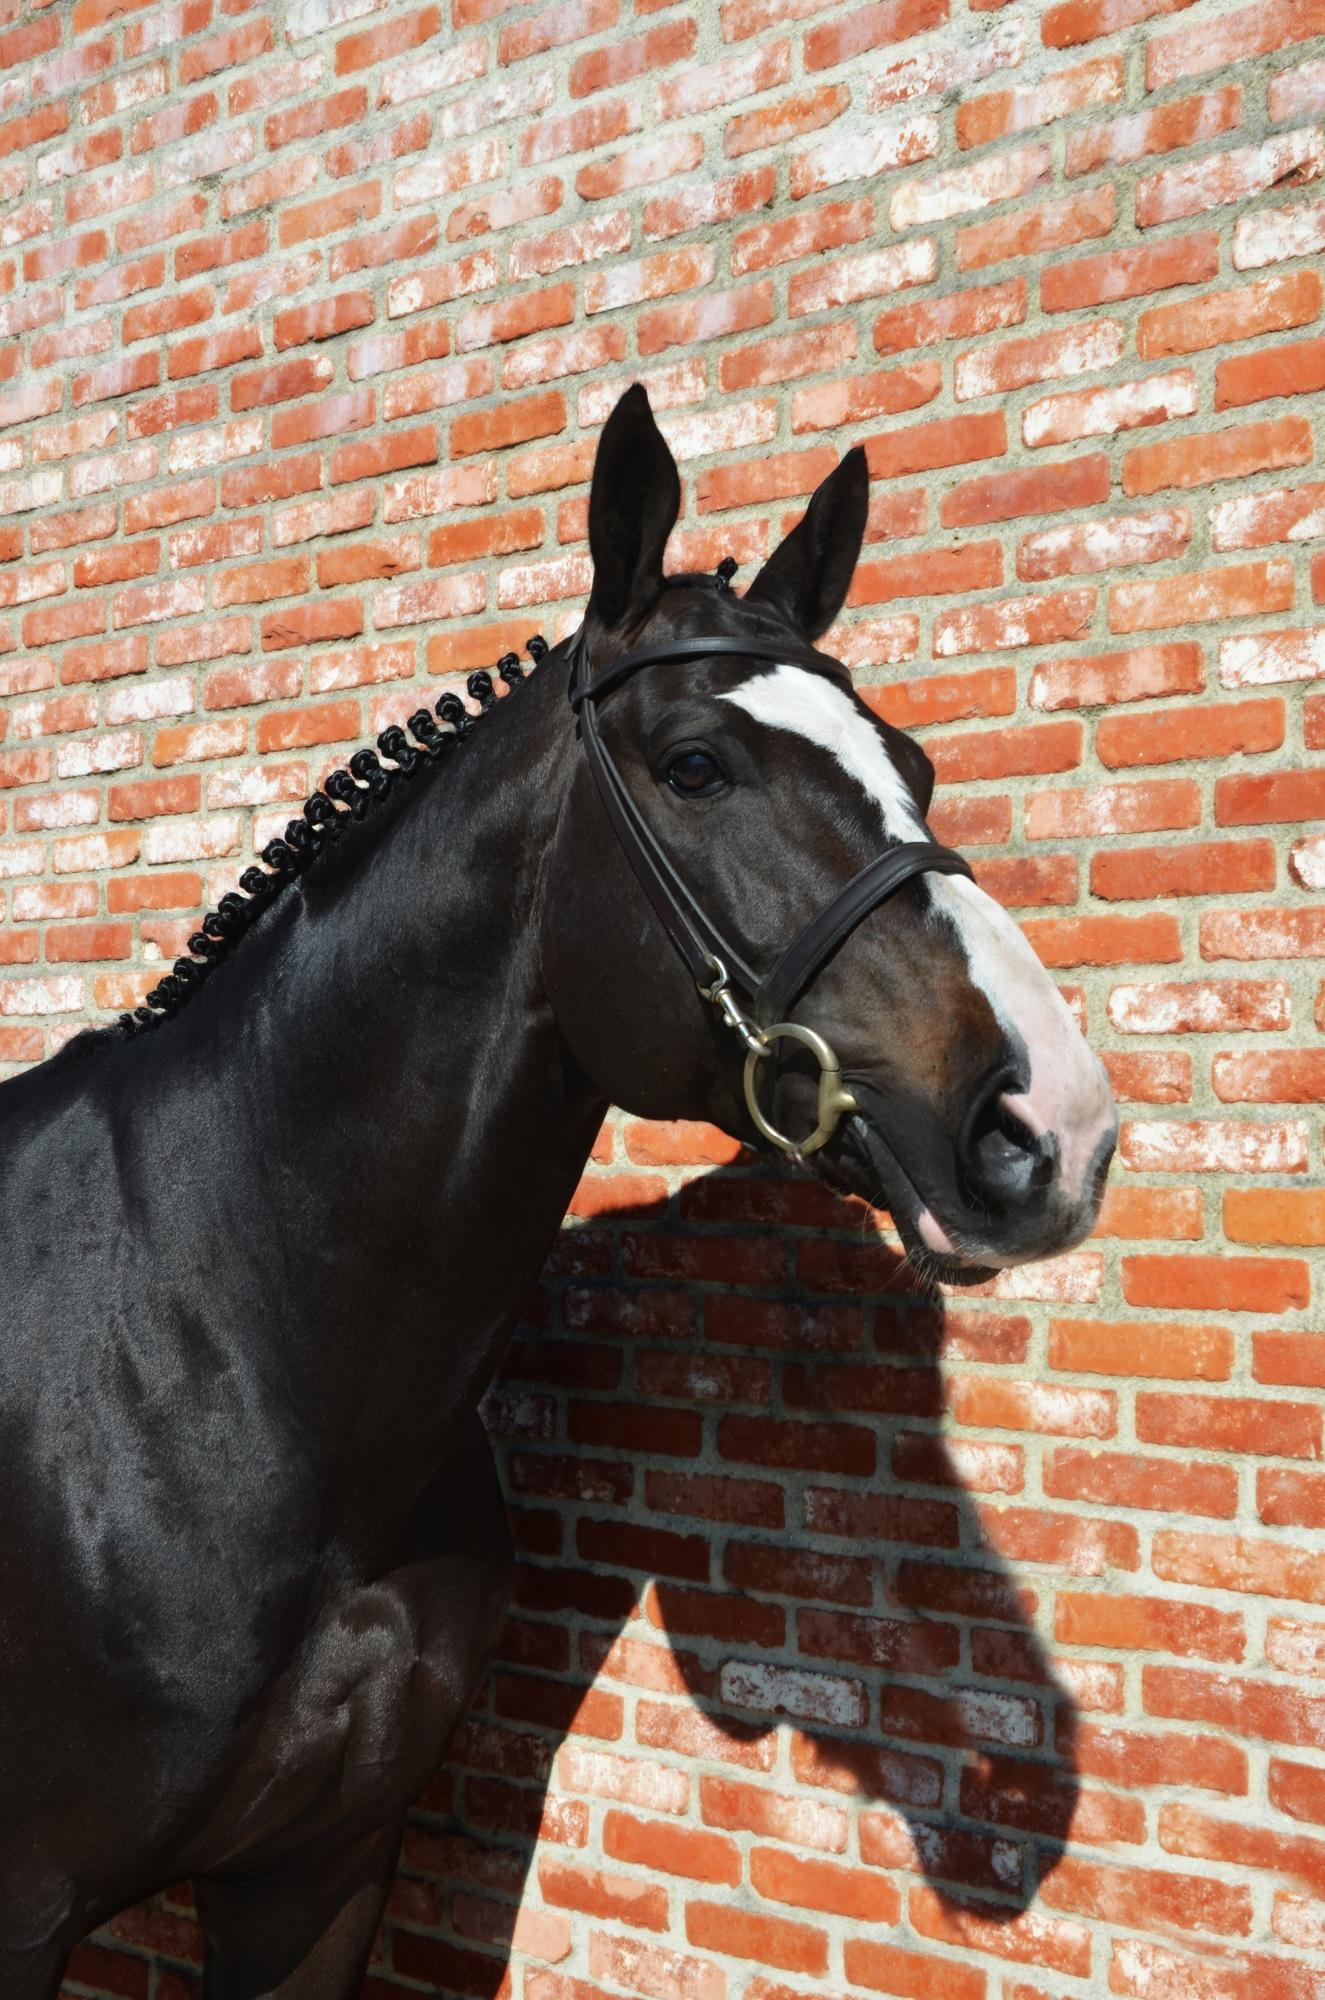 Le blue diamond vant ruytershof | JV Horses